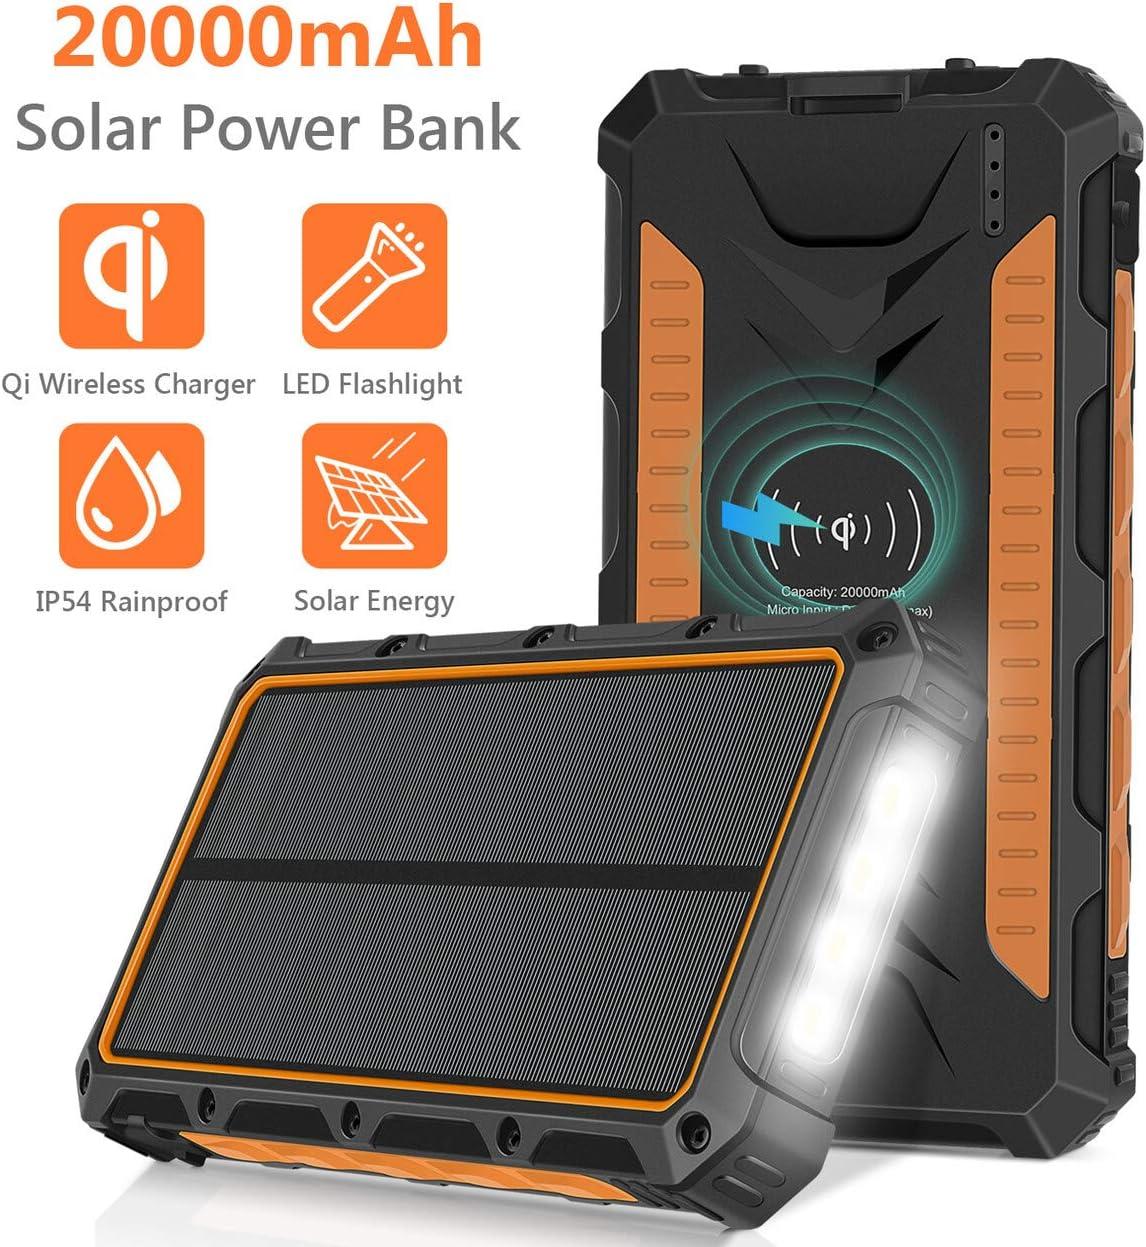 Rugged Qi wireless 20000mAh Solar Power